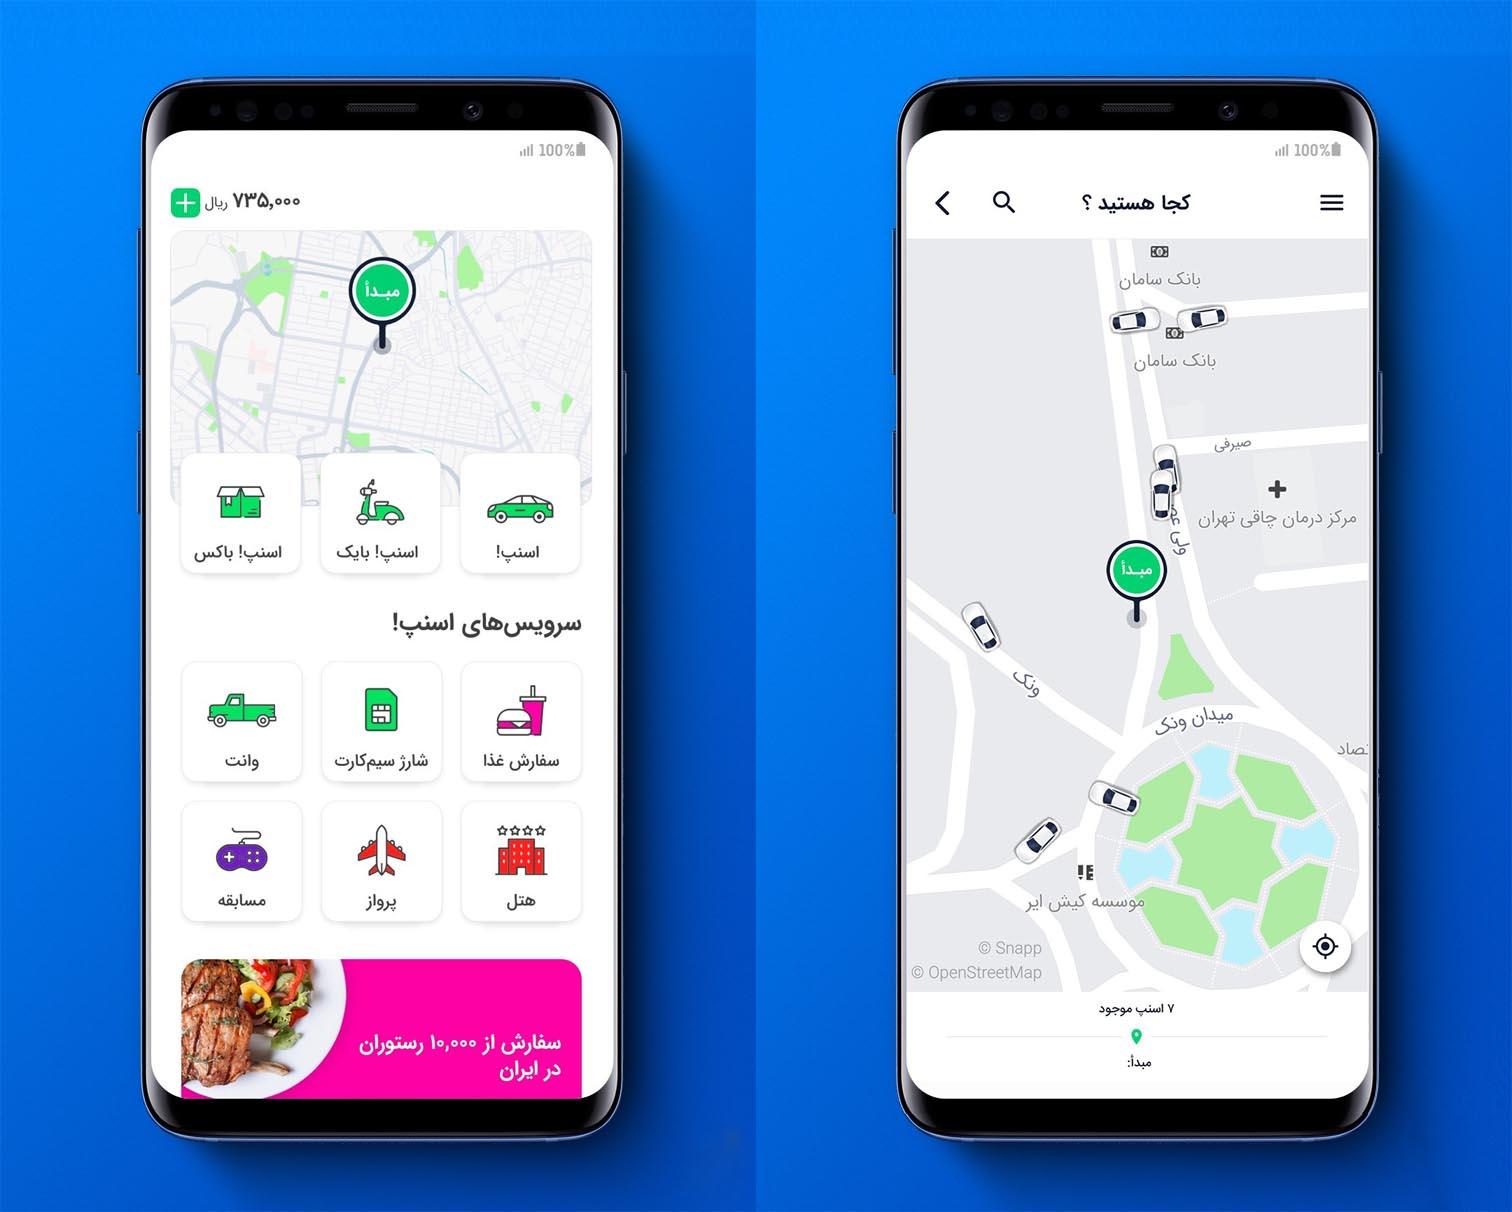 اپلیکیشن درخواست آنلاین خودرو اسنپ | چیکاو